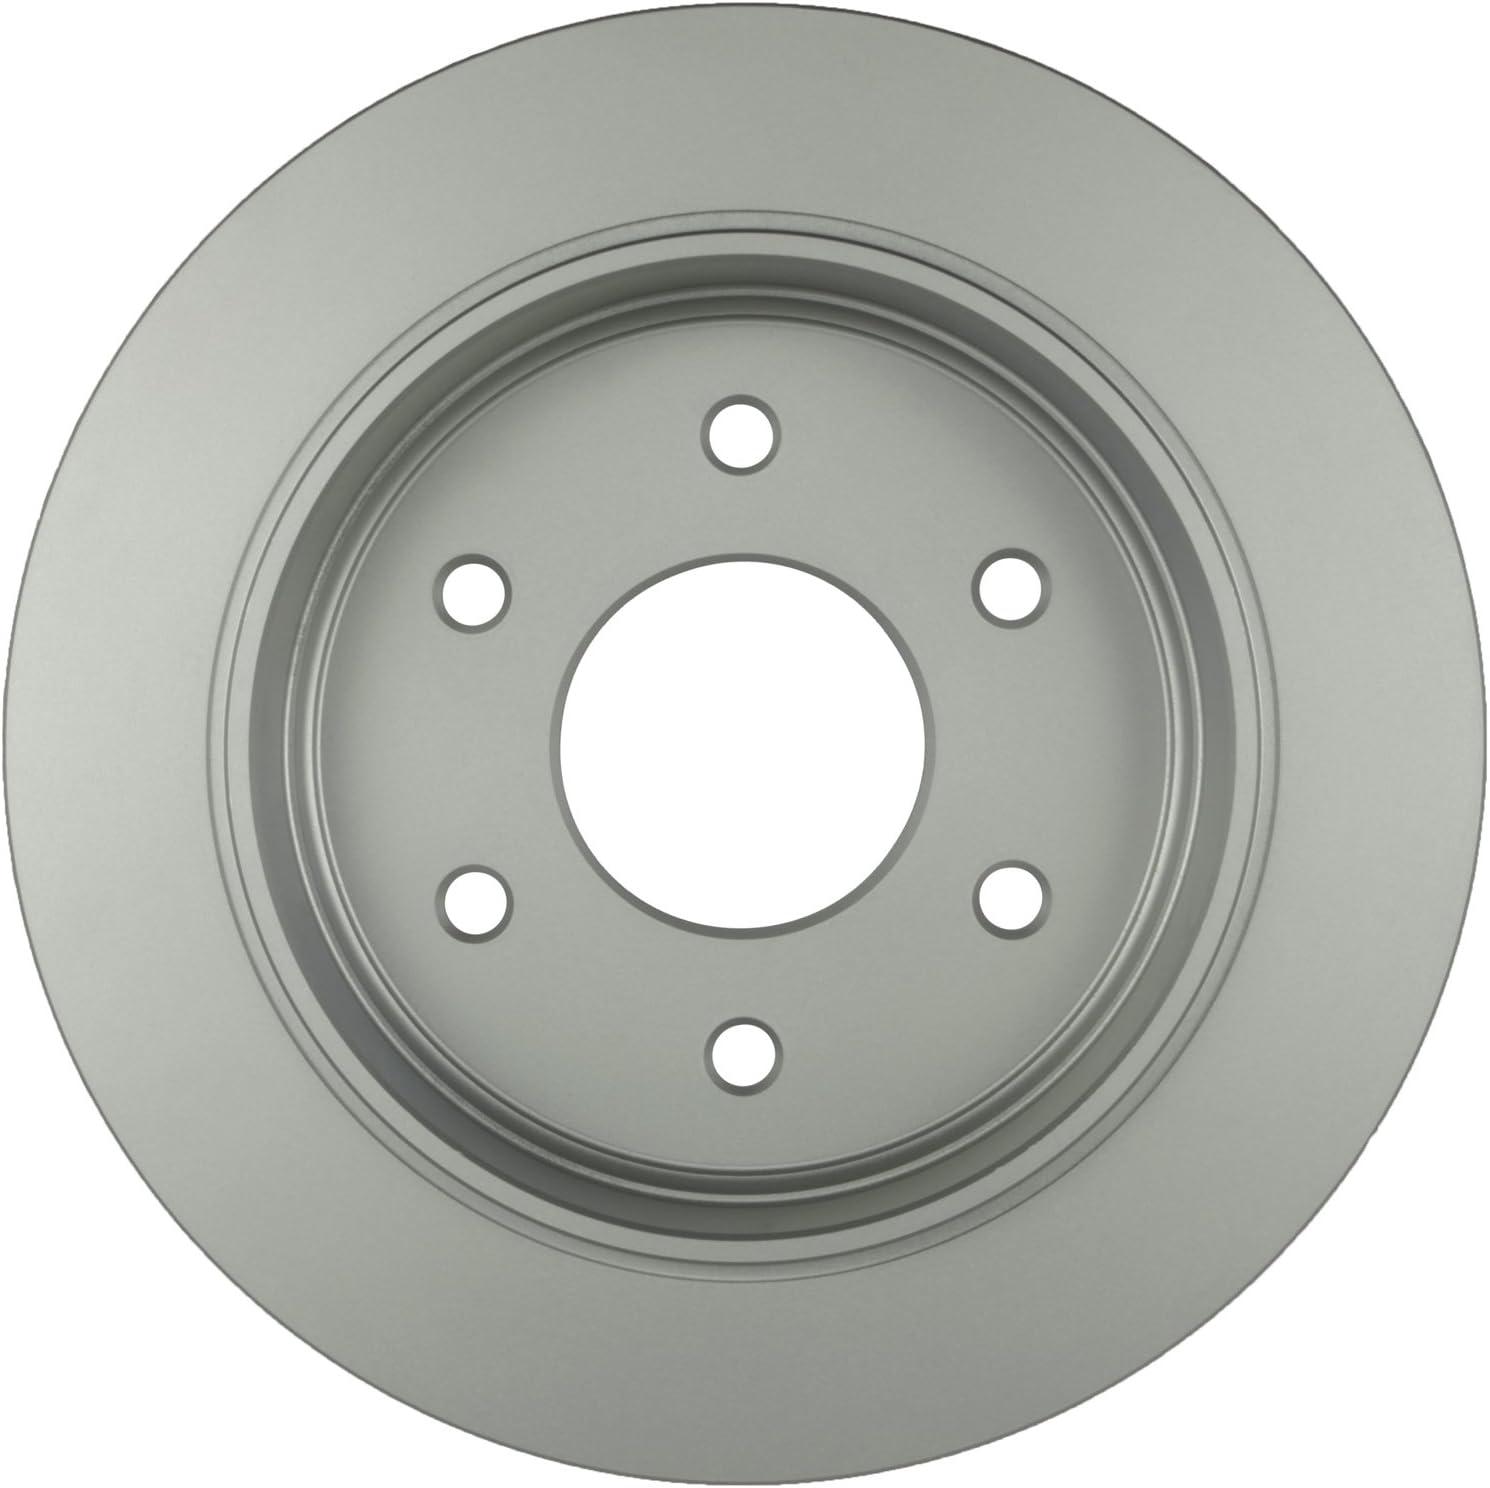 Max Brakes Rear Premium Brake Kit Fits: 2010 10 2011 11 2012 12 Nissan Armada KT085142 OE Series Rotors + Ceramic Pads